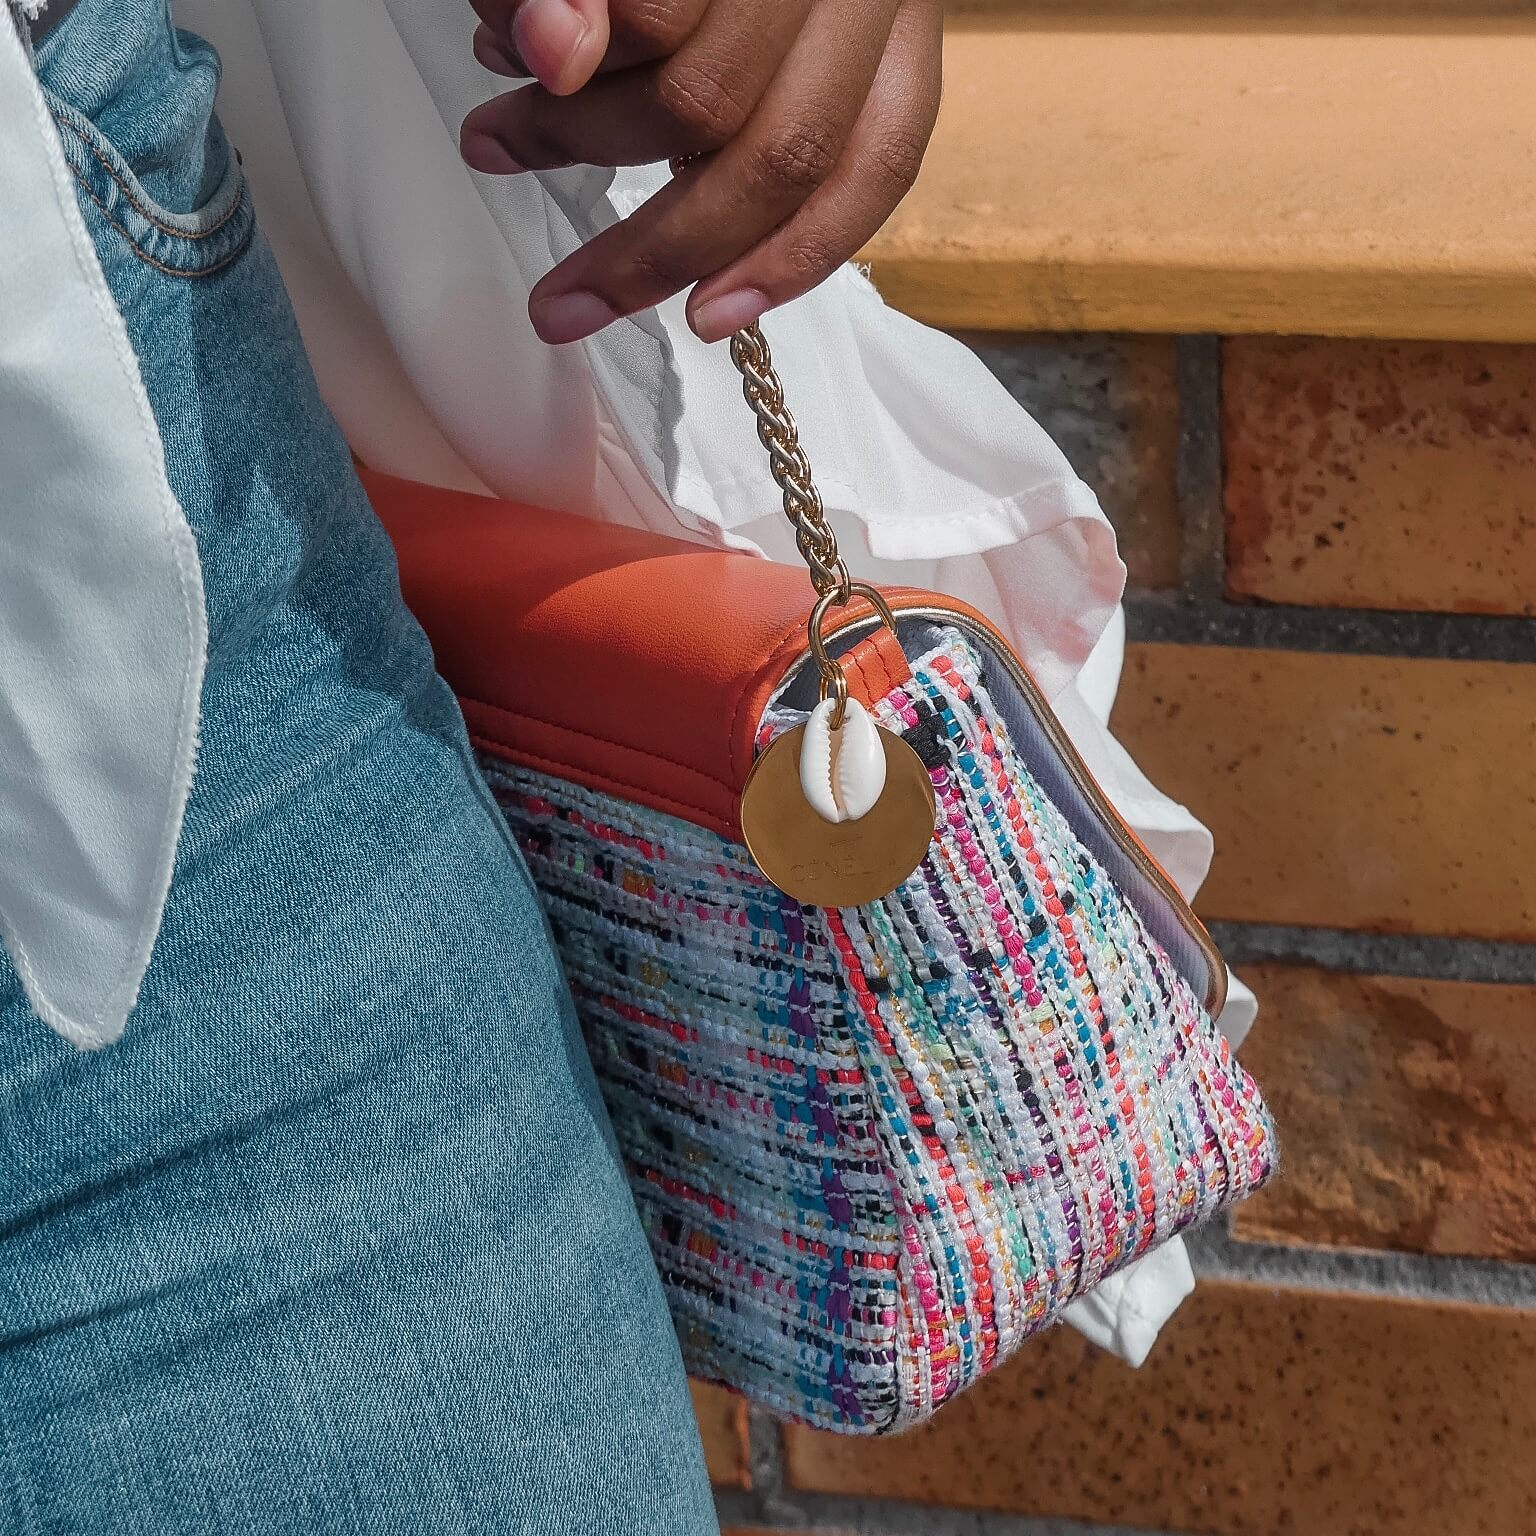 sac mode en tweed - sac femme coloré Cénélia